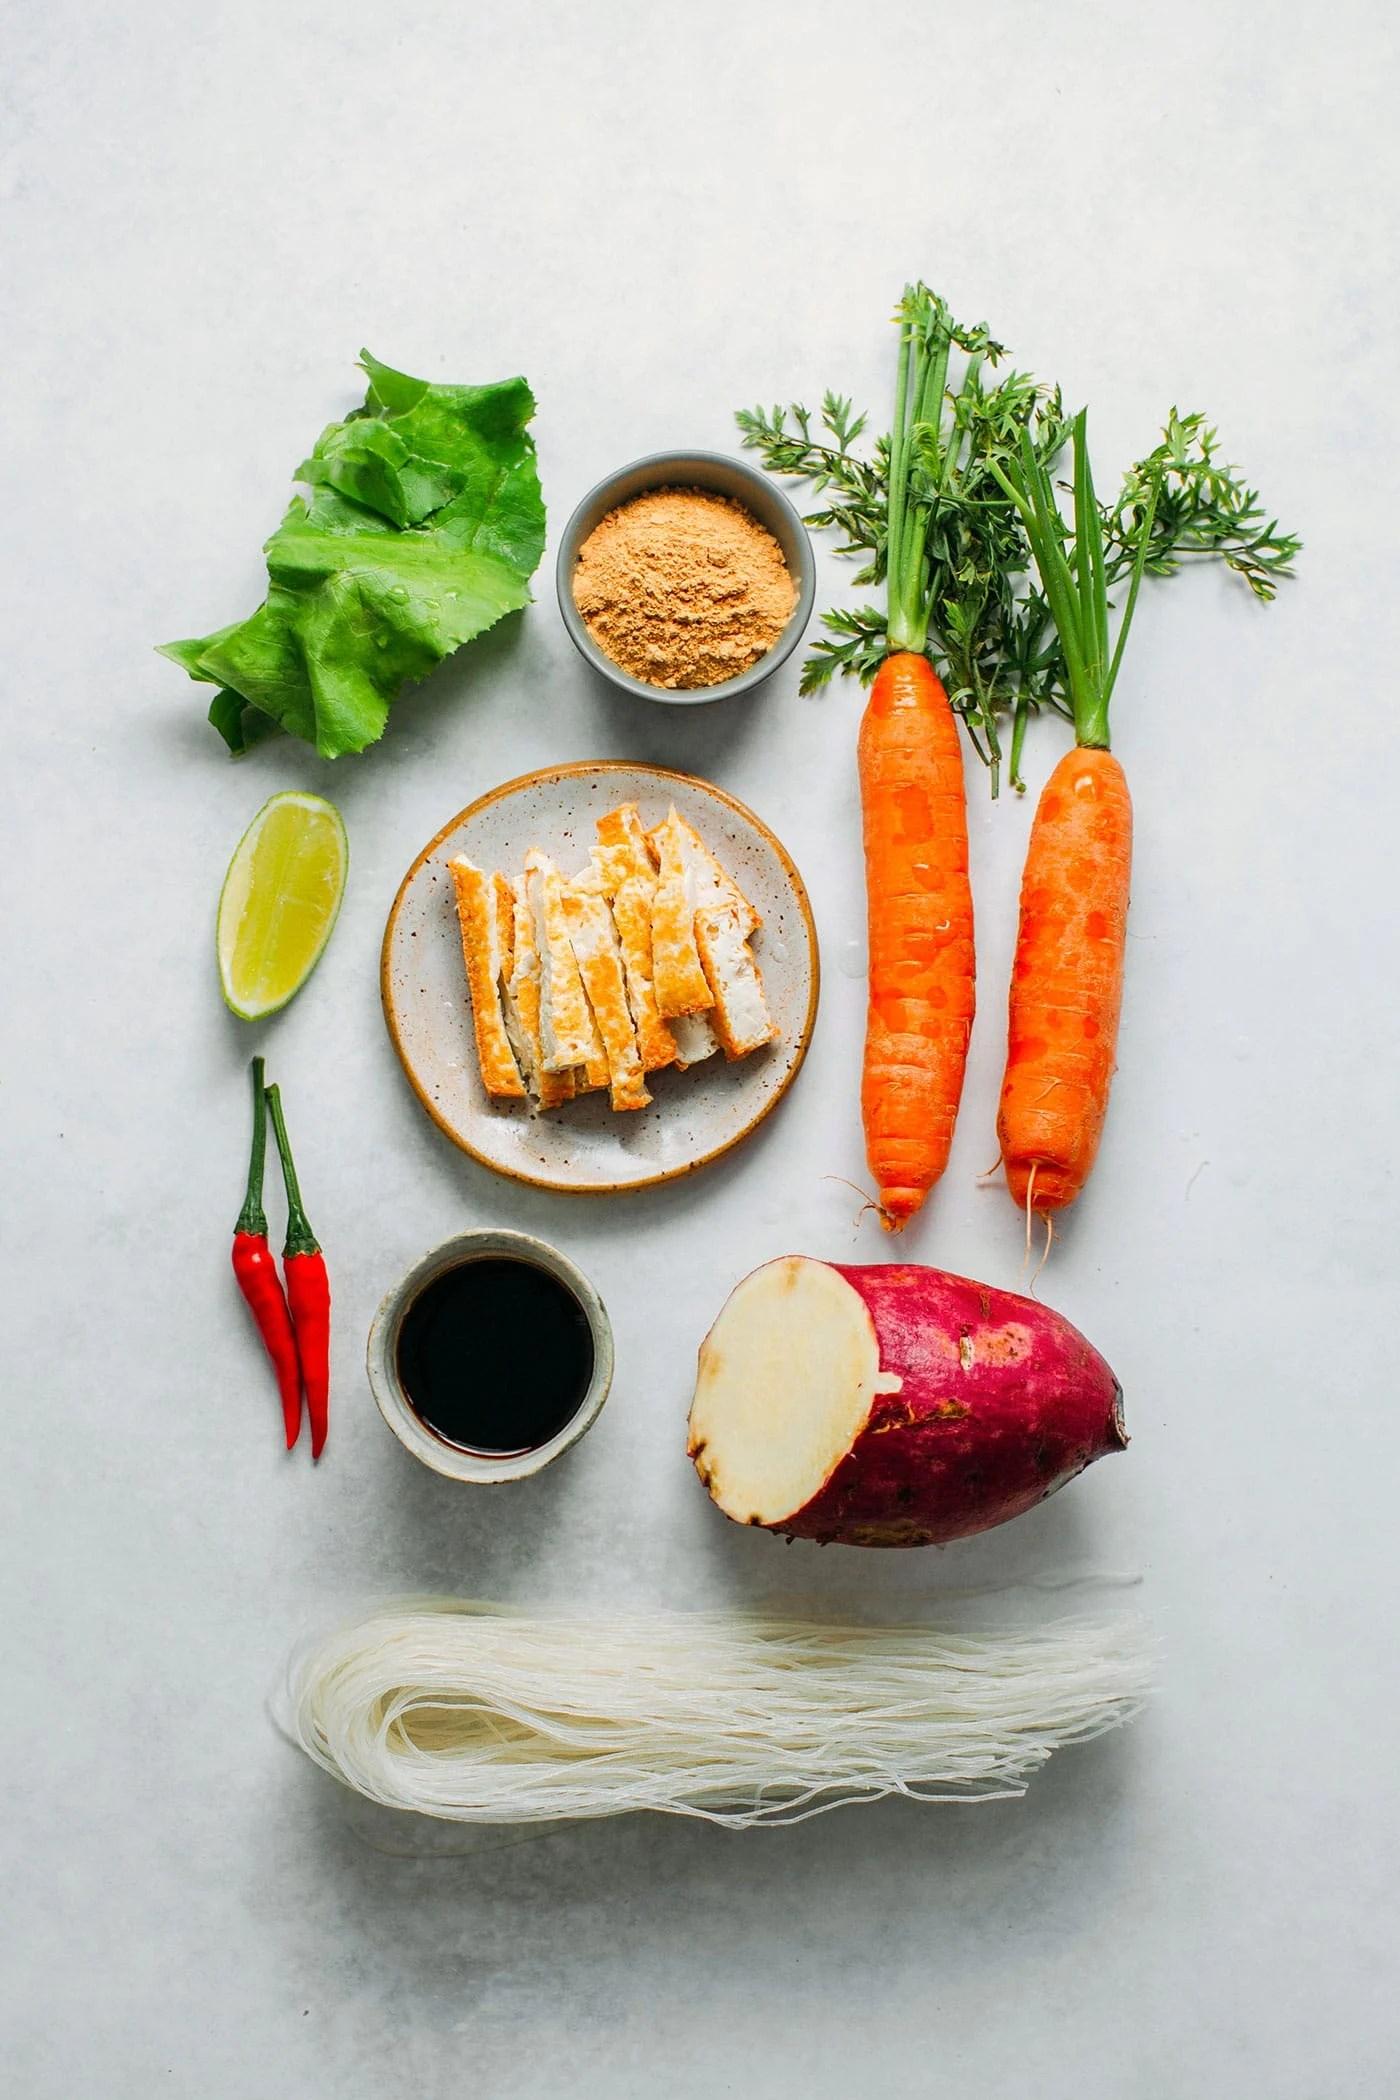 Vegan Bì Cuốn (Vietnamese Rolls)